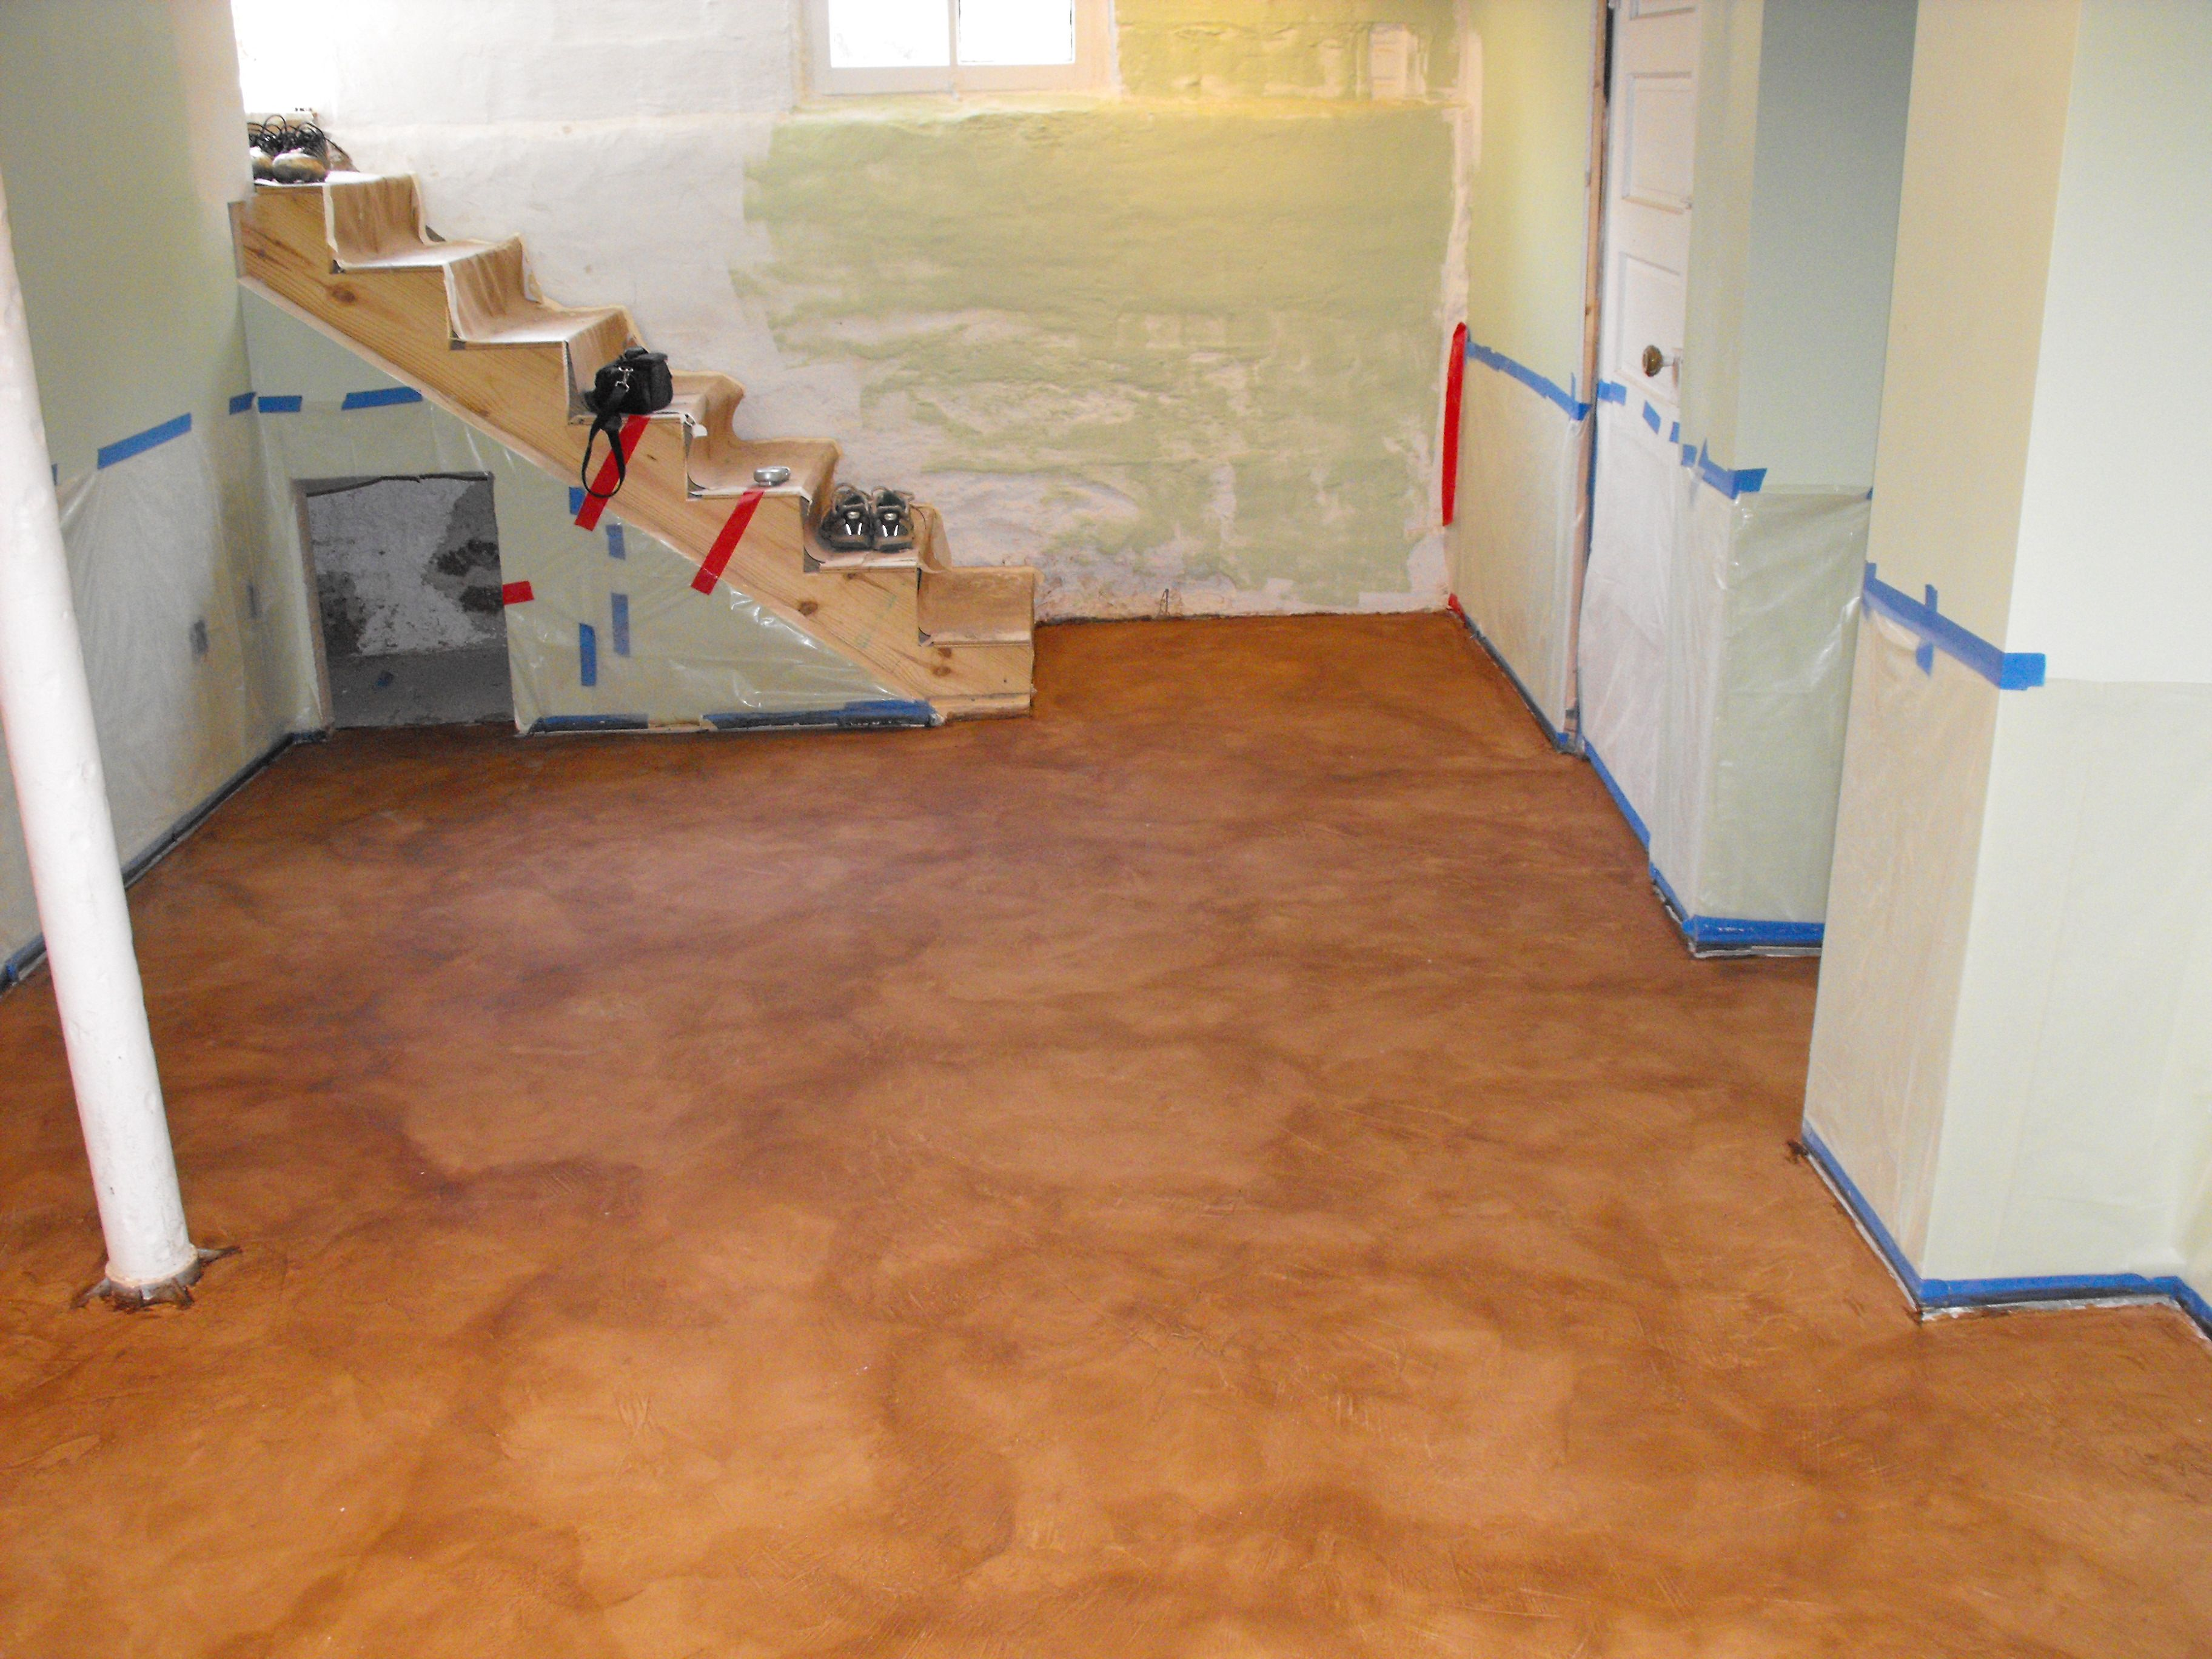 Stain On Concrete Basement Floor Fort Wayne In Nick Dancer Concrete 3 Jpg 3648 2736 Painted Concrete Floors Basement Flooring Options Flooring